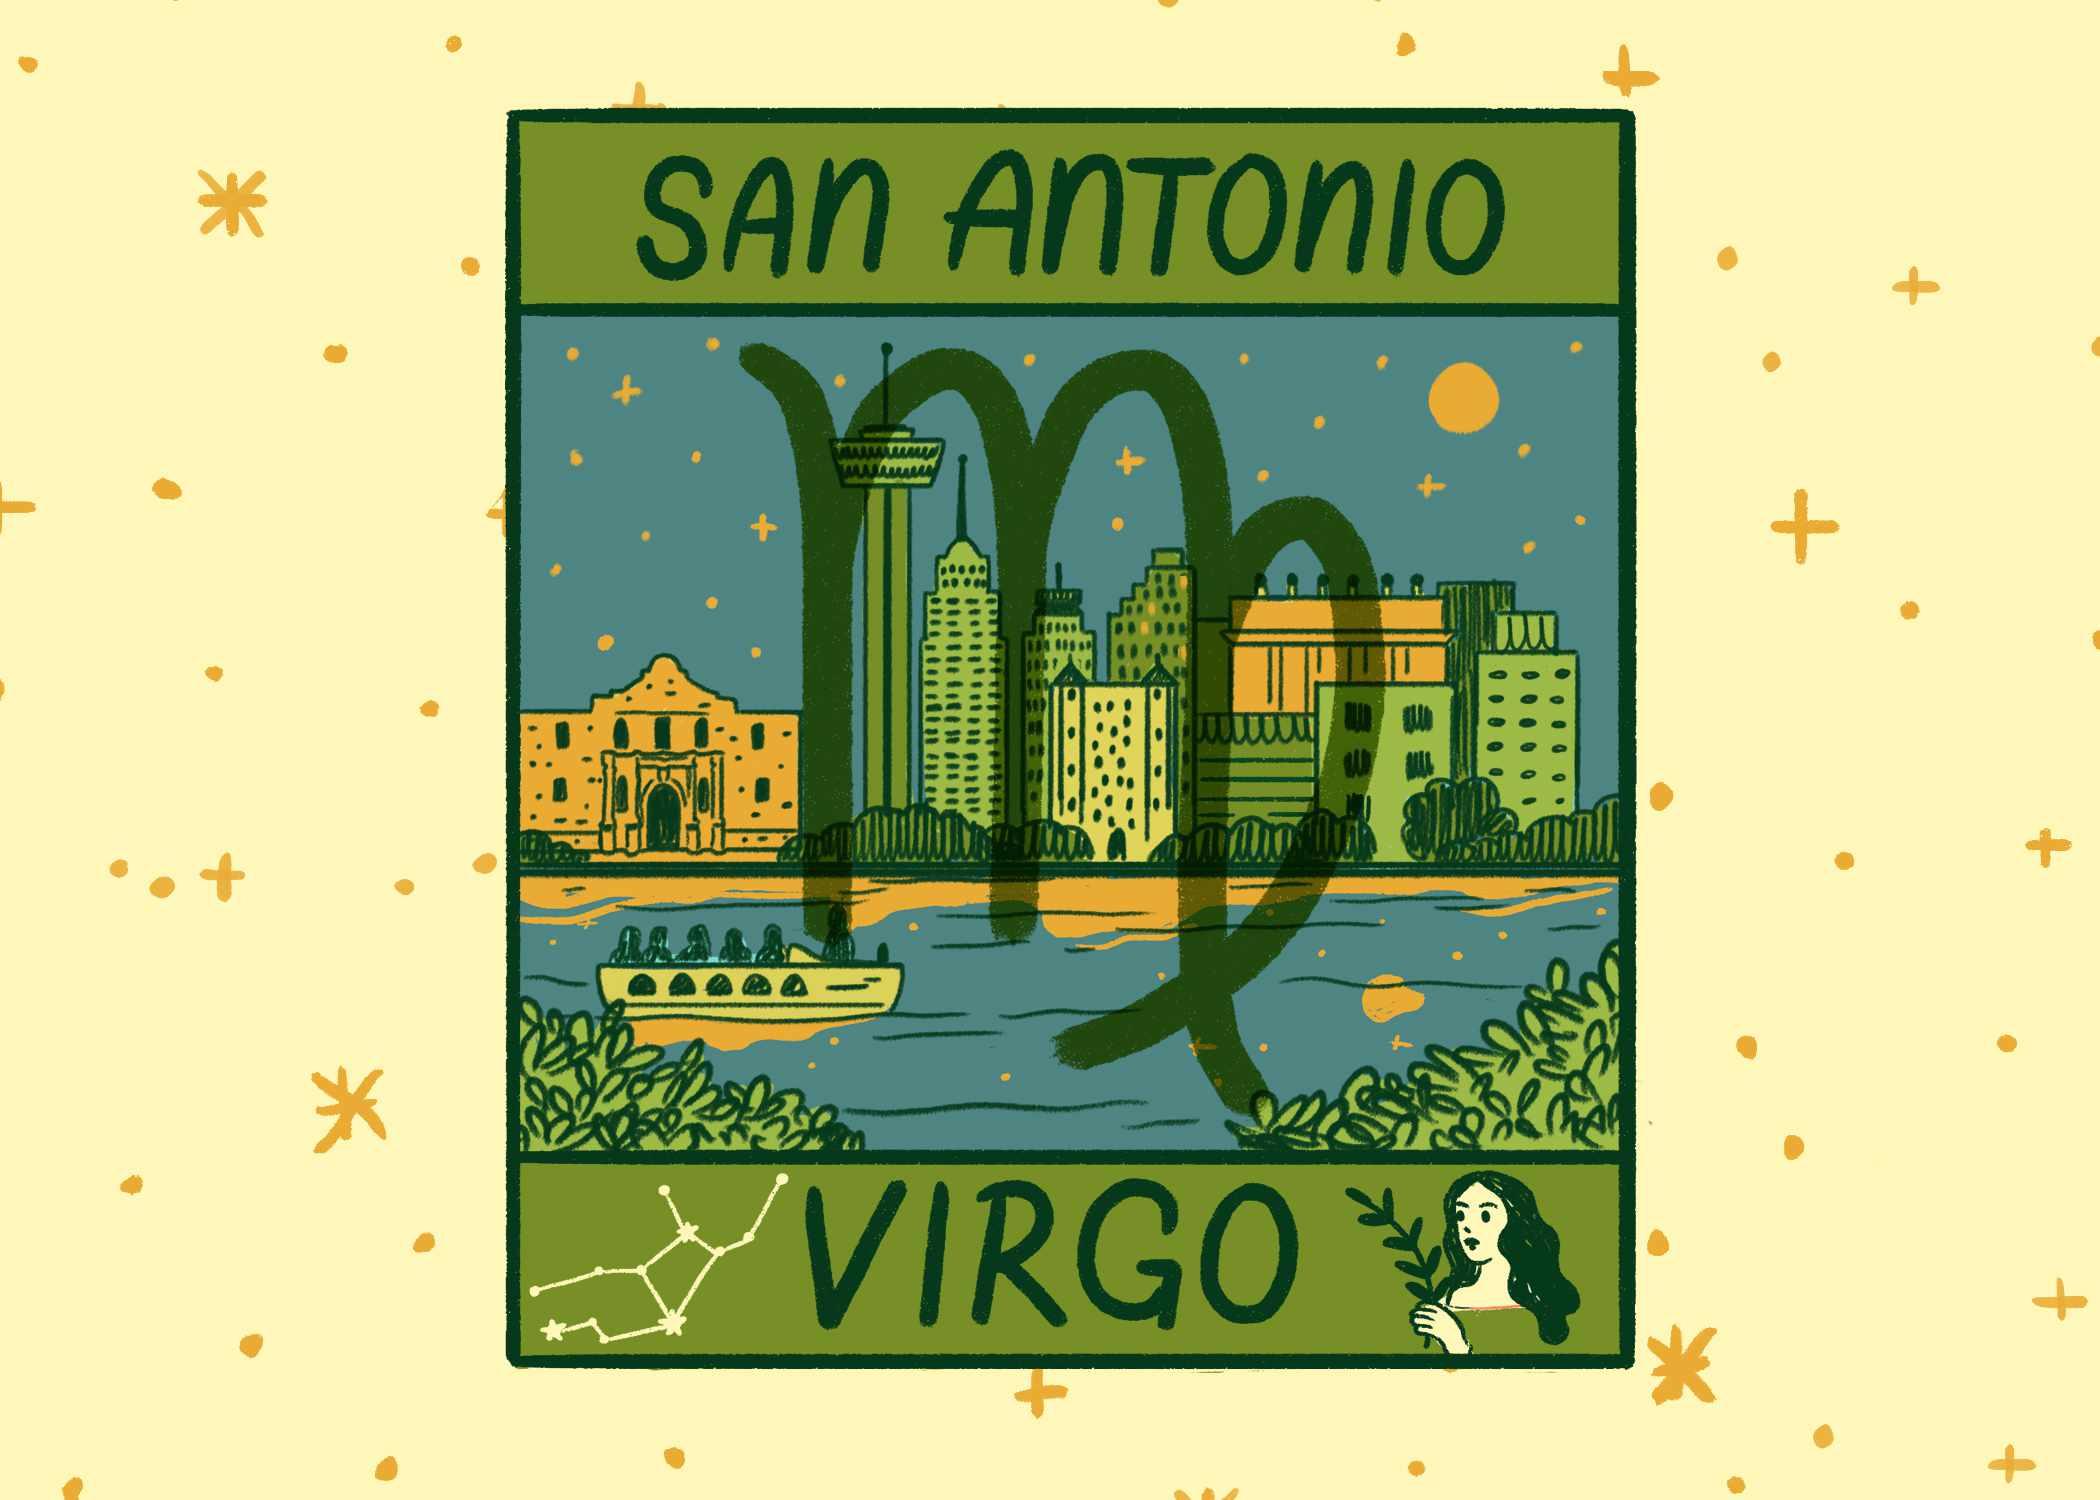 Illustration of San Antonio and Virgo